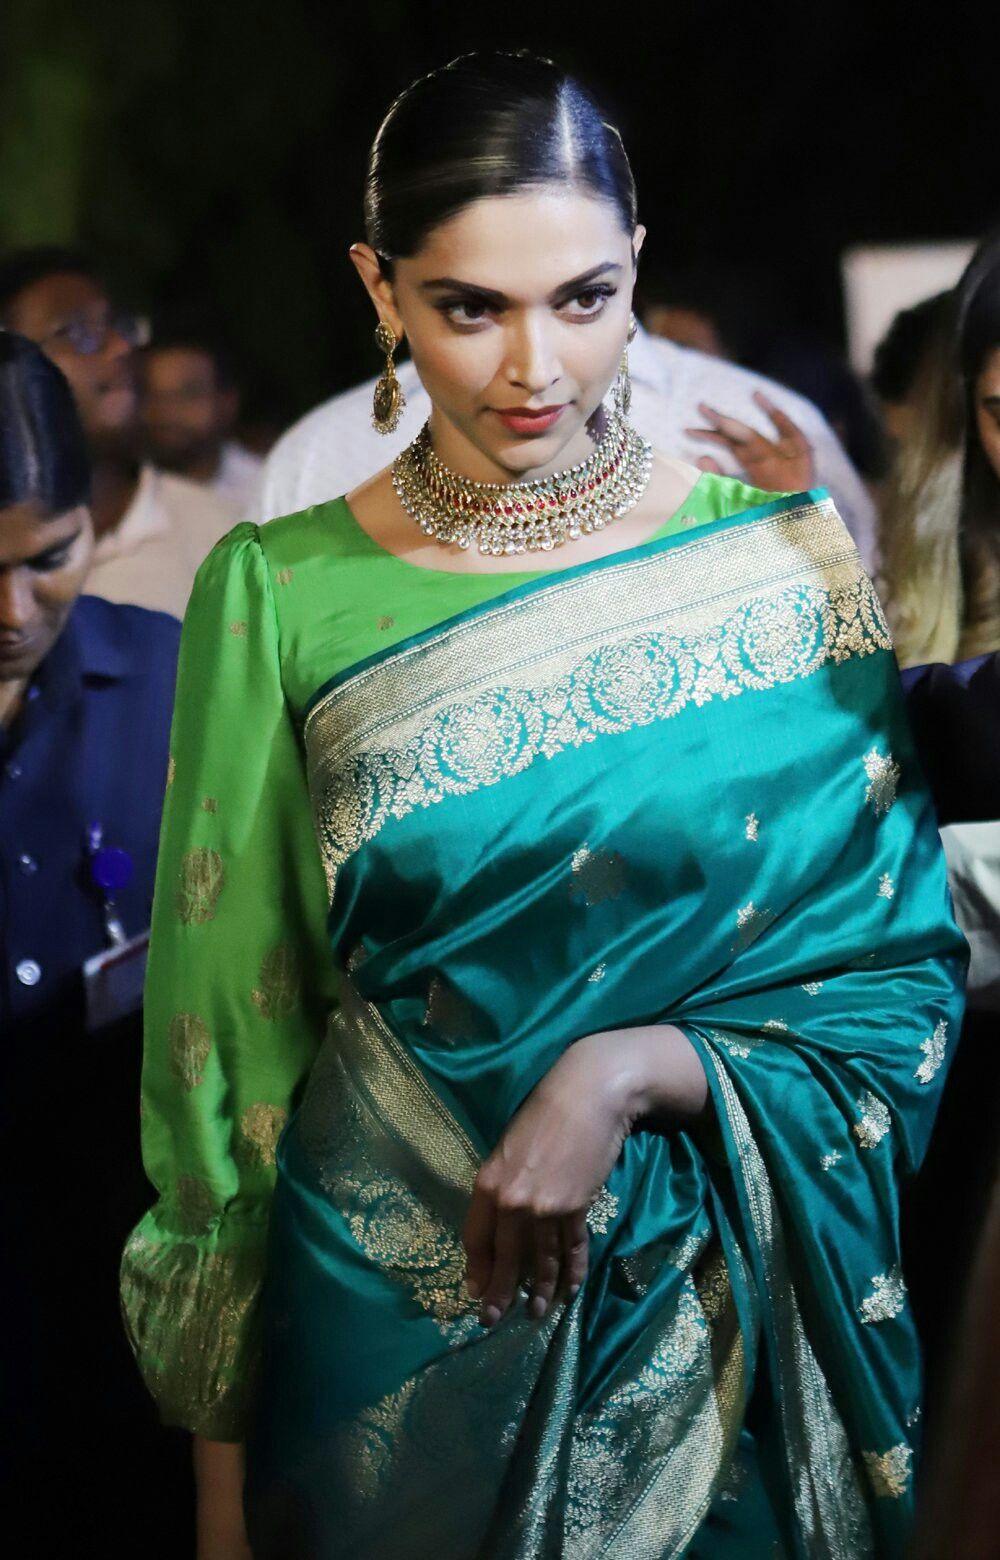 Pin by siddhesha yadav on Deepika Padukone | Indian sari ...